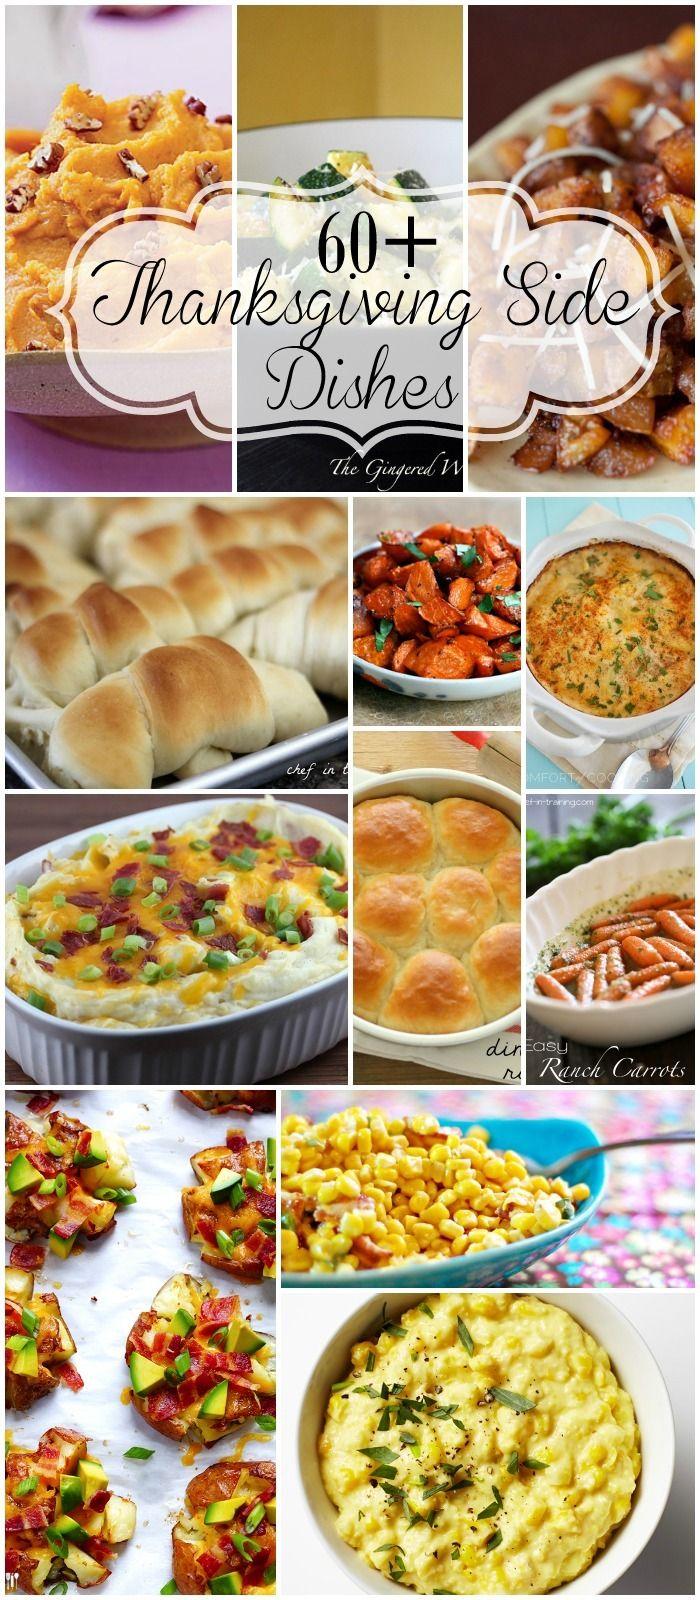 60+ Thanksgiving Sides - veggies, potatoes, and rolls perfect for Thanksgiving dinner!! { lilluna.com }